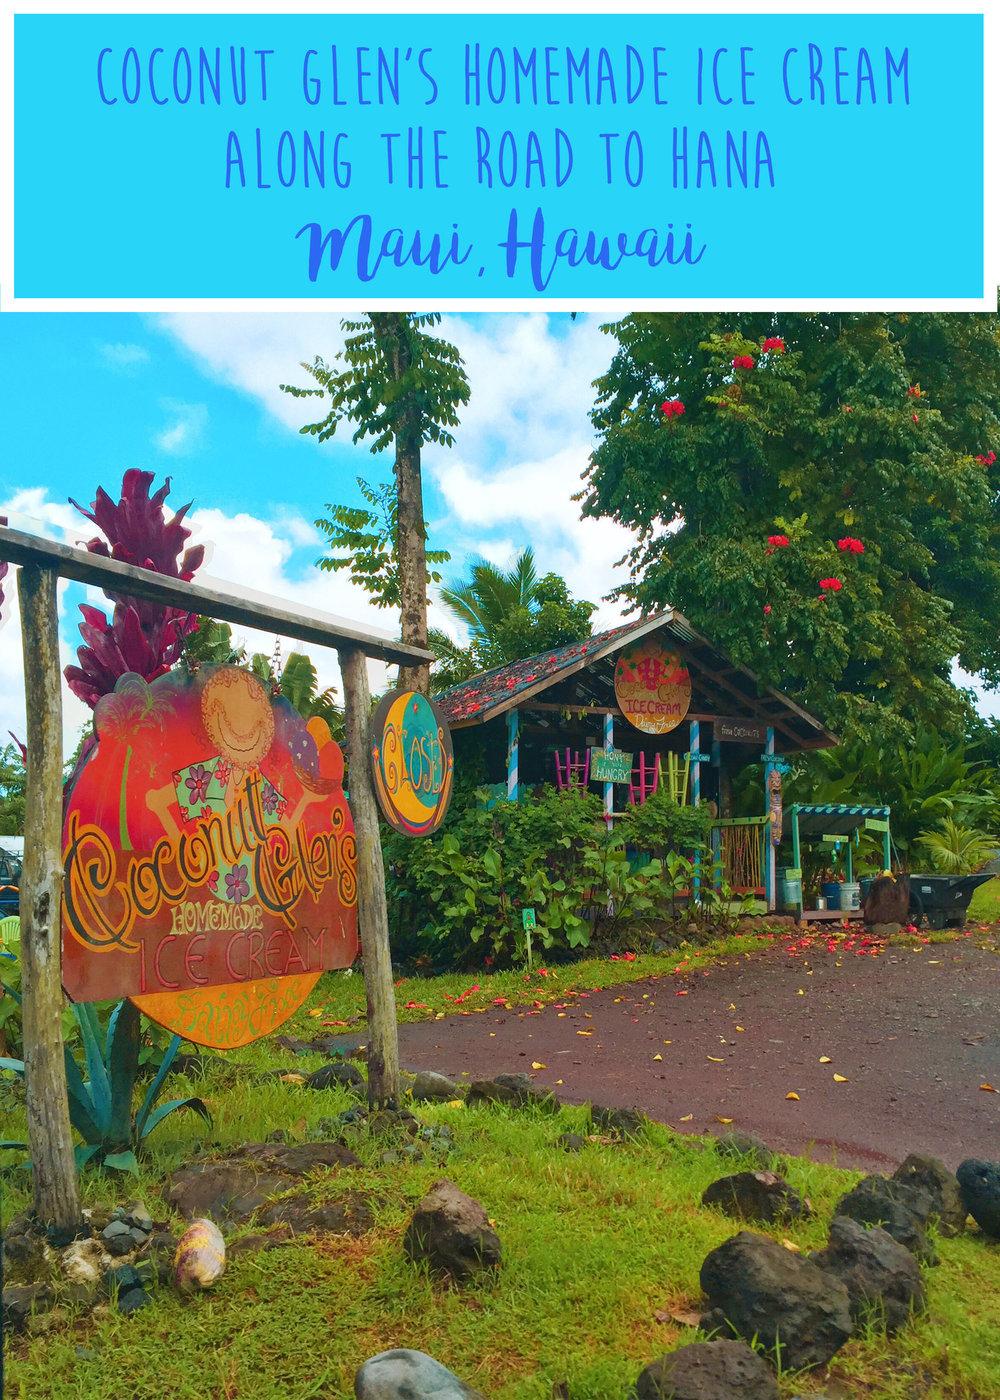 Coconut+Glen's+Organic+Homemade+Ice+Cream+-+Road+to+Hana,+Maui,+Hawaii+-+Wandering+Jokas+Travel+&+Ice+Cream+Blog.jpeg